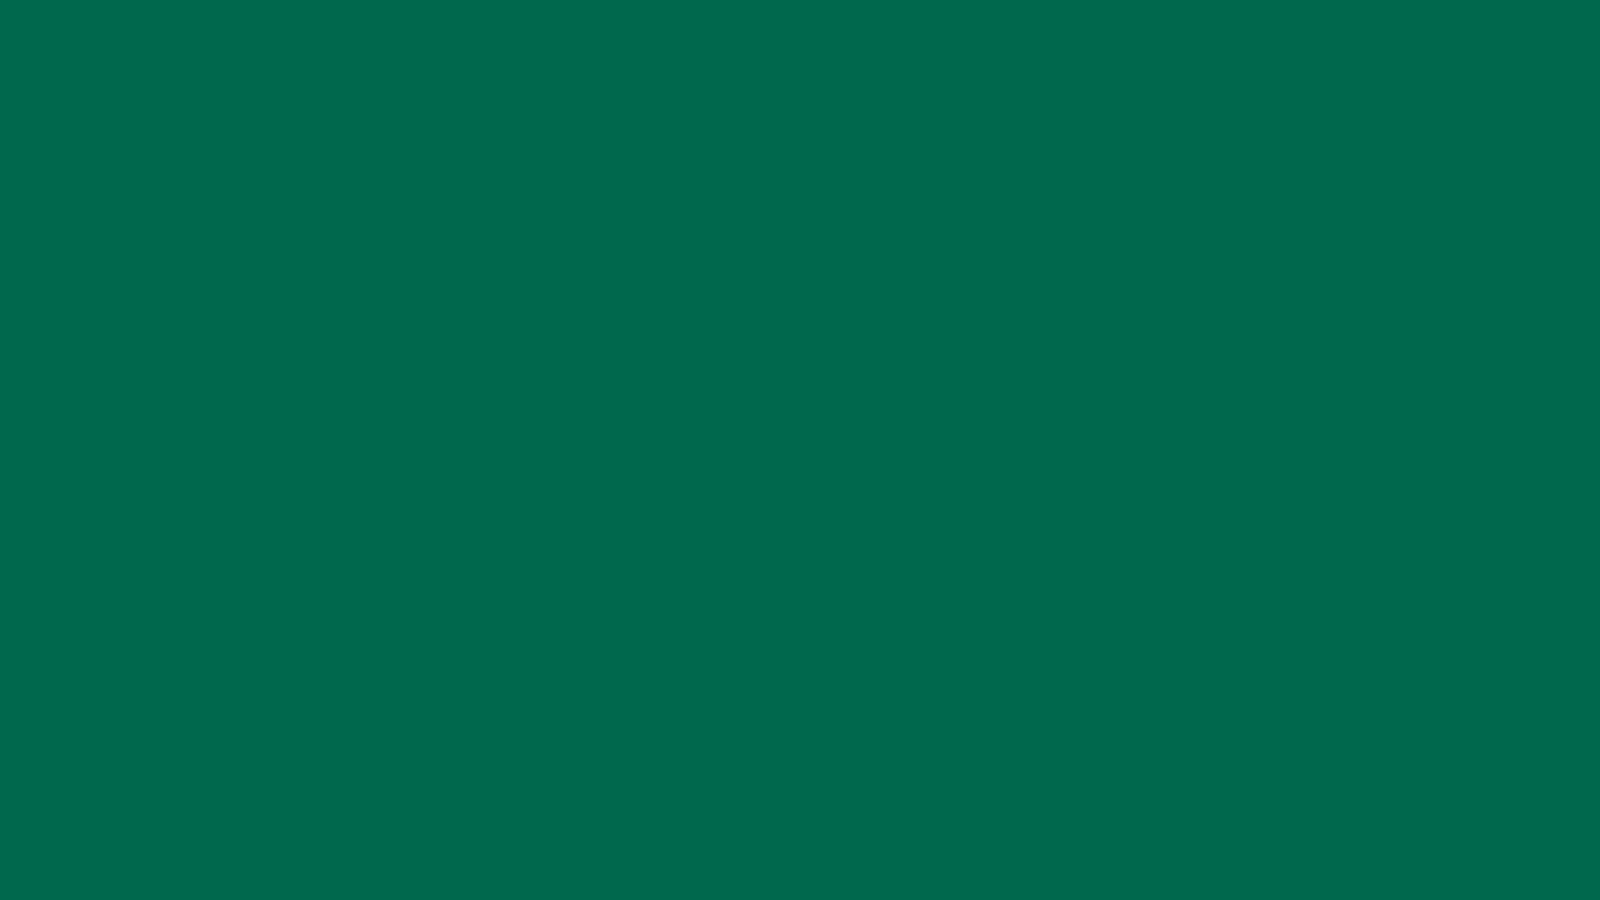 1600x900 Bottle Green Solid Color Background